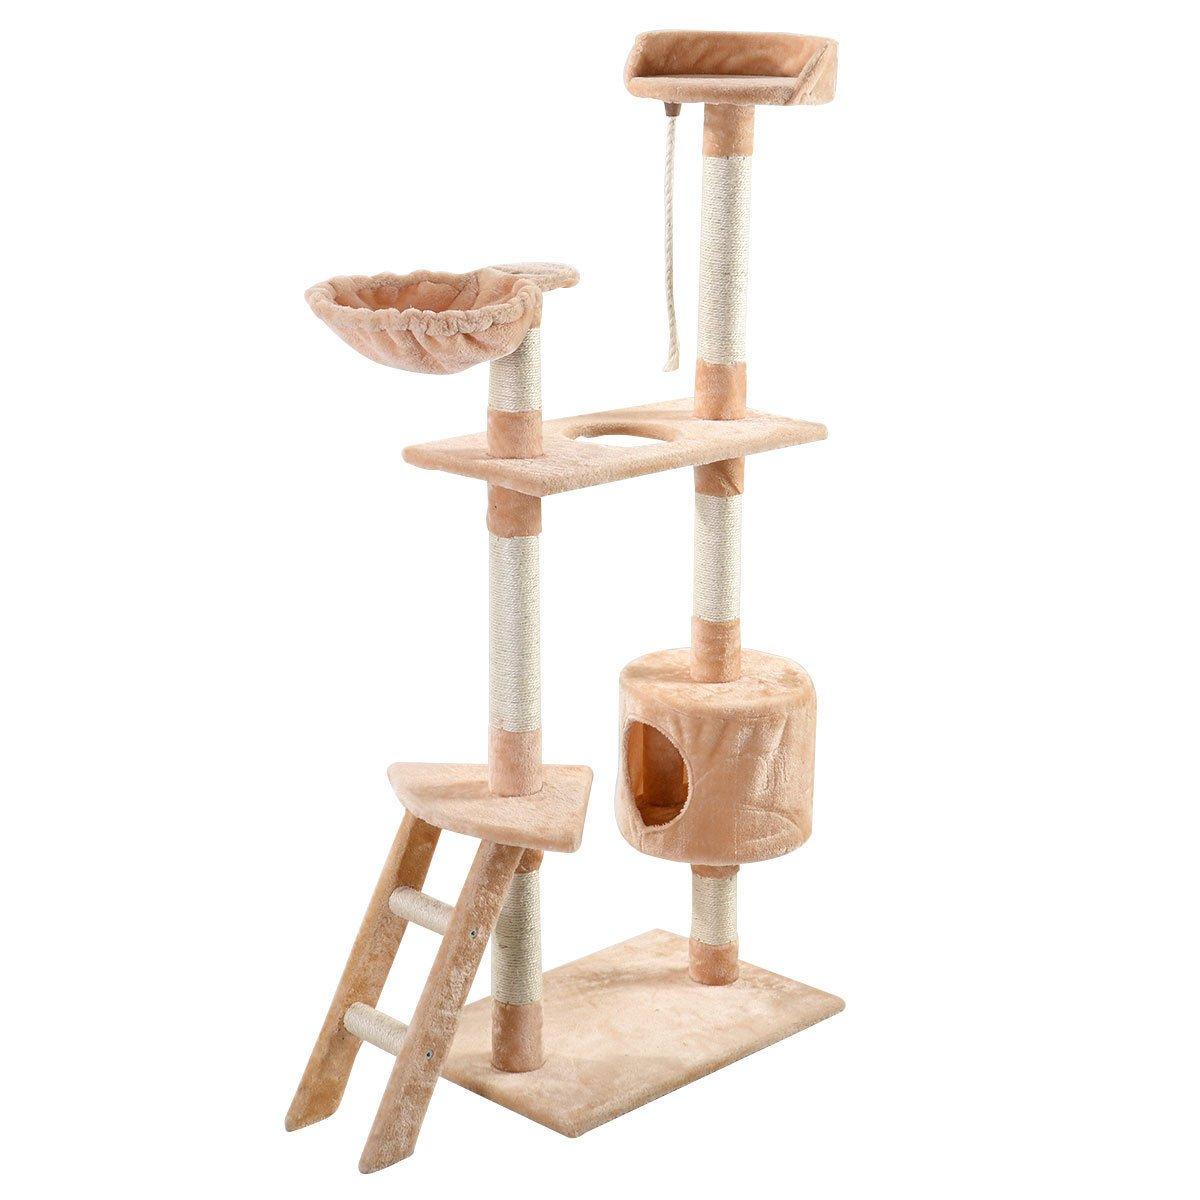 Eight24hours New 60'' Cat Tree Tower Condo Scratcher Furniture Kitten Pet House Hammock Beige + FREE E-Book